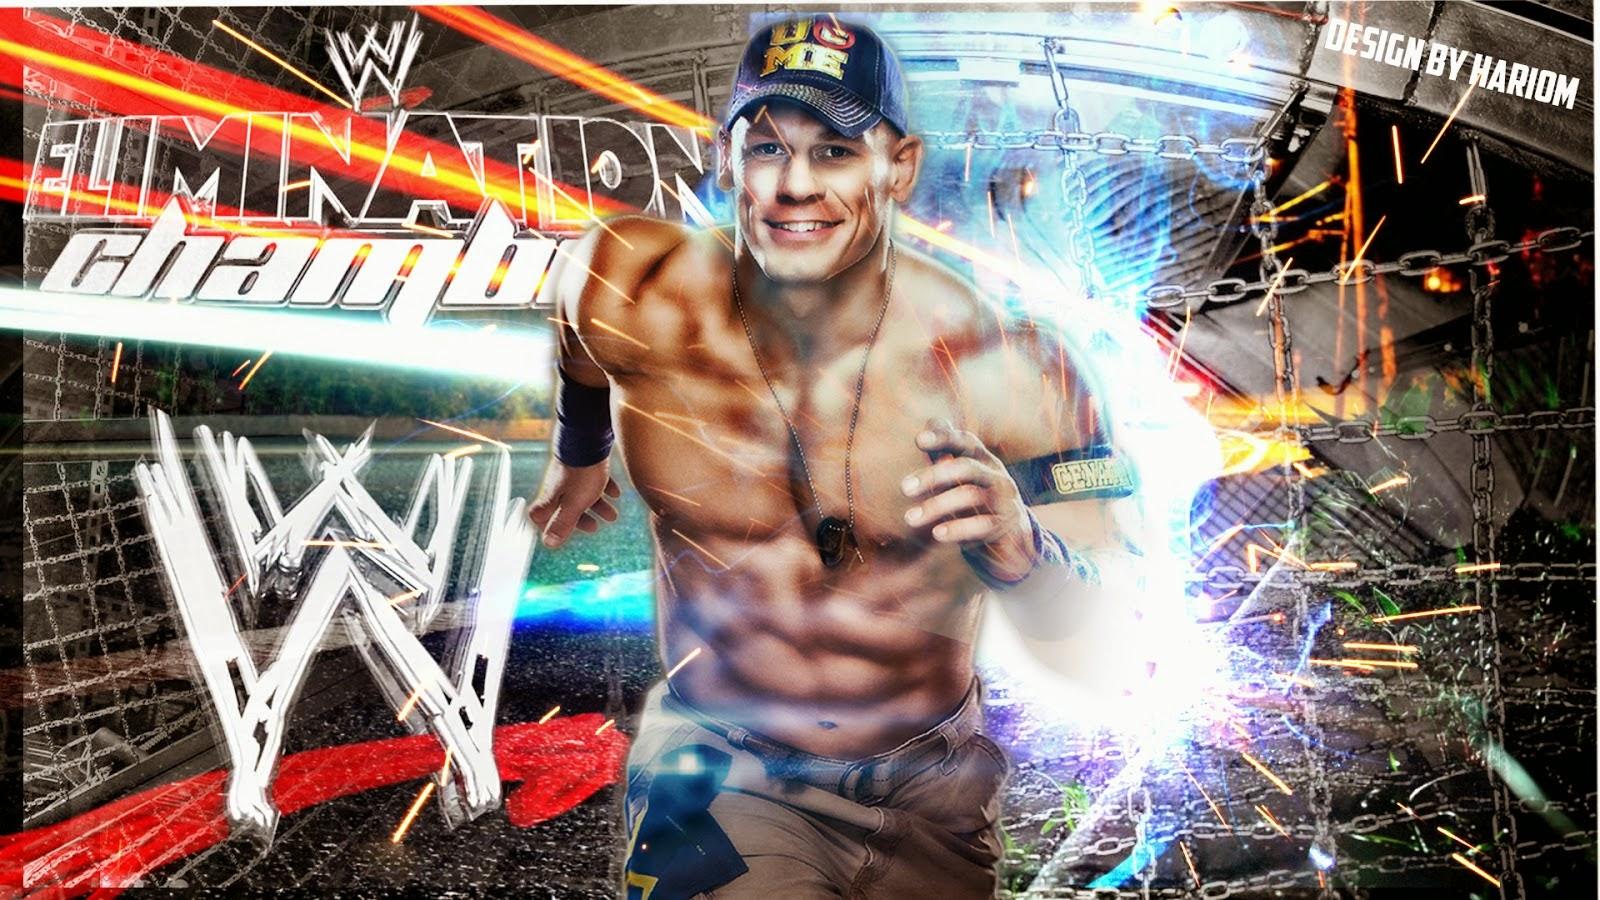 WWE Elimination Chamber 2014 HD Wallpapers WWE Wrestling 1600x900